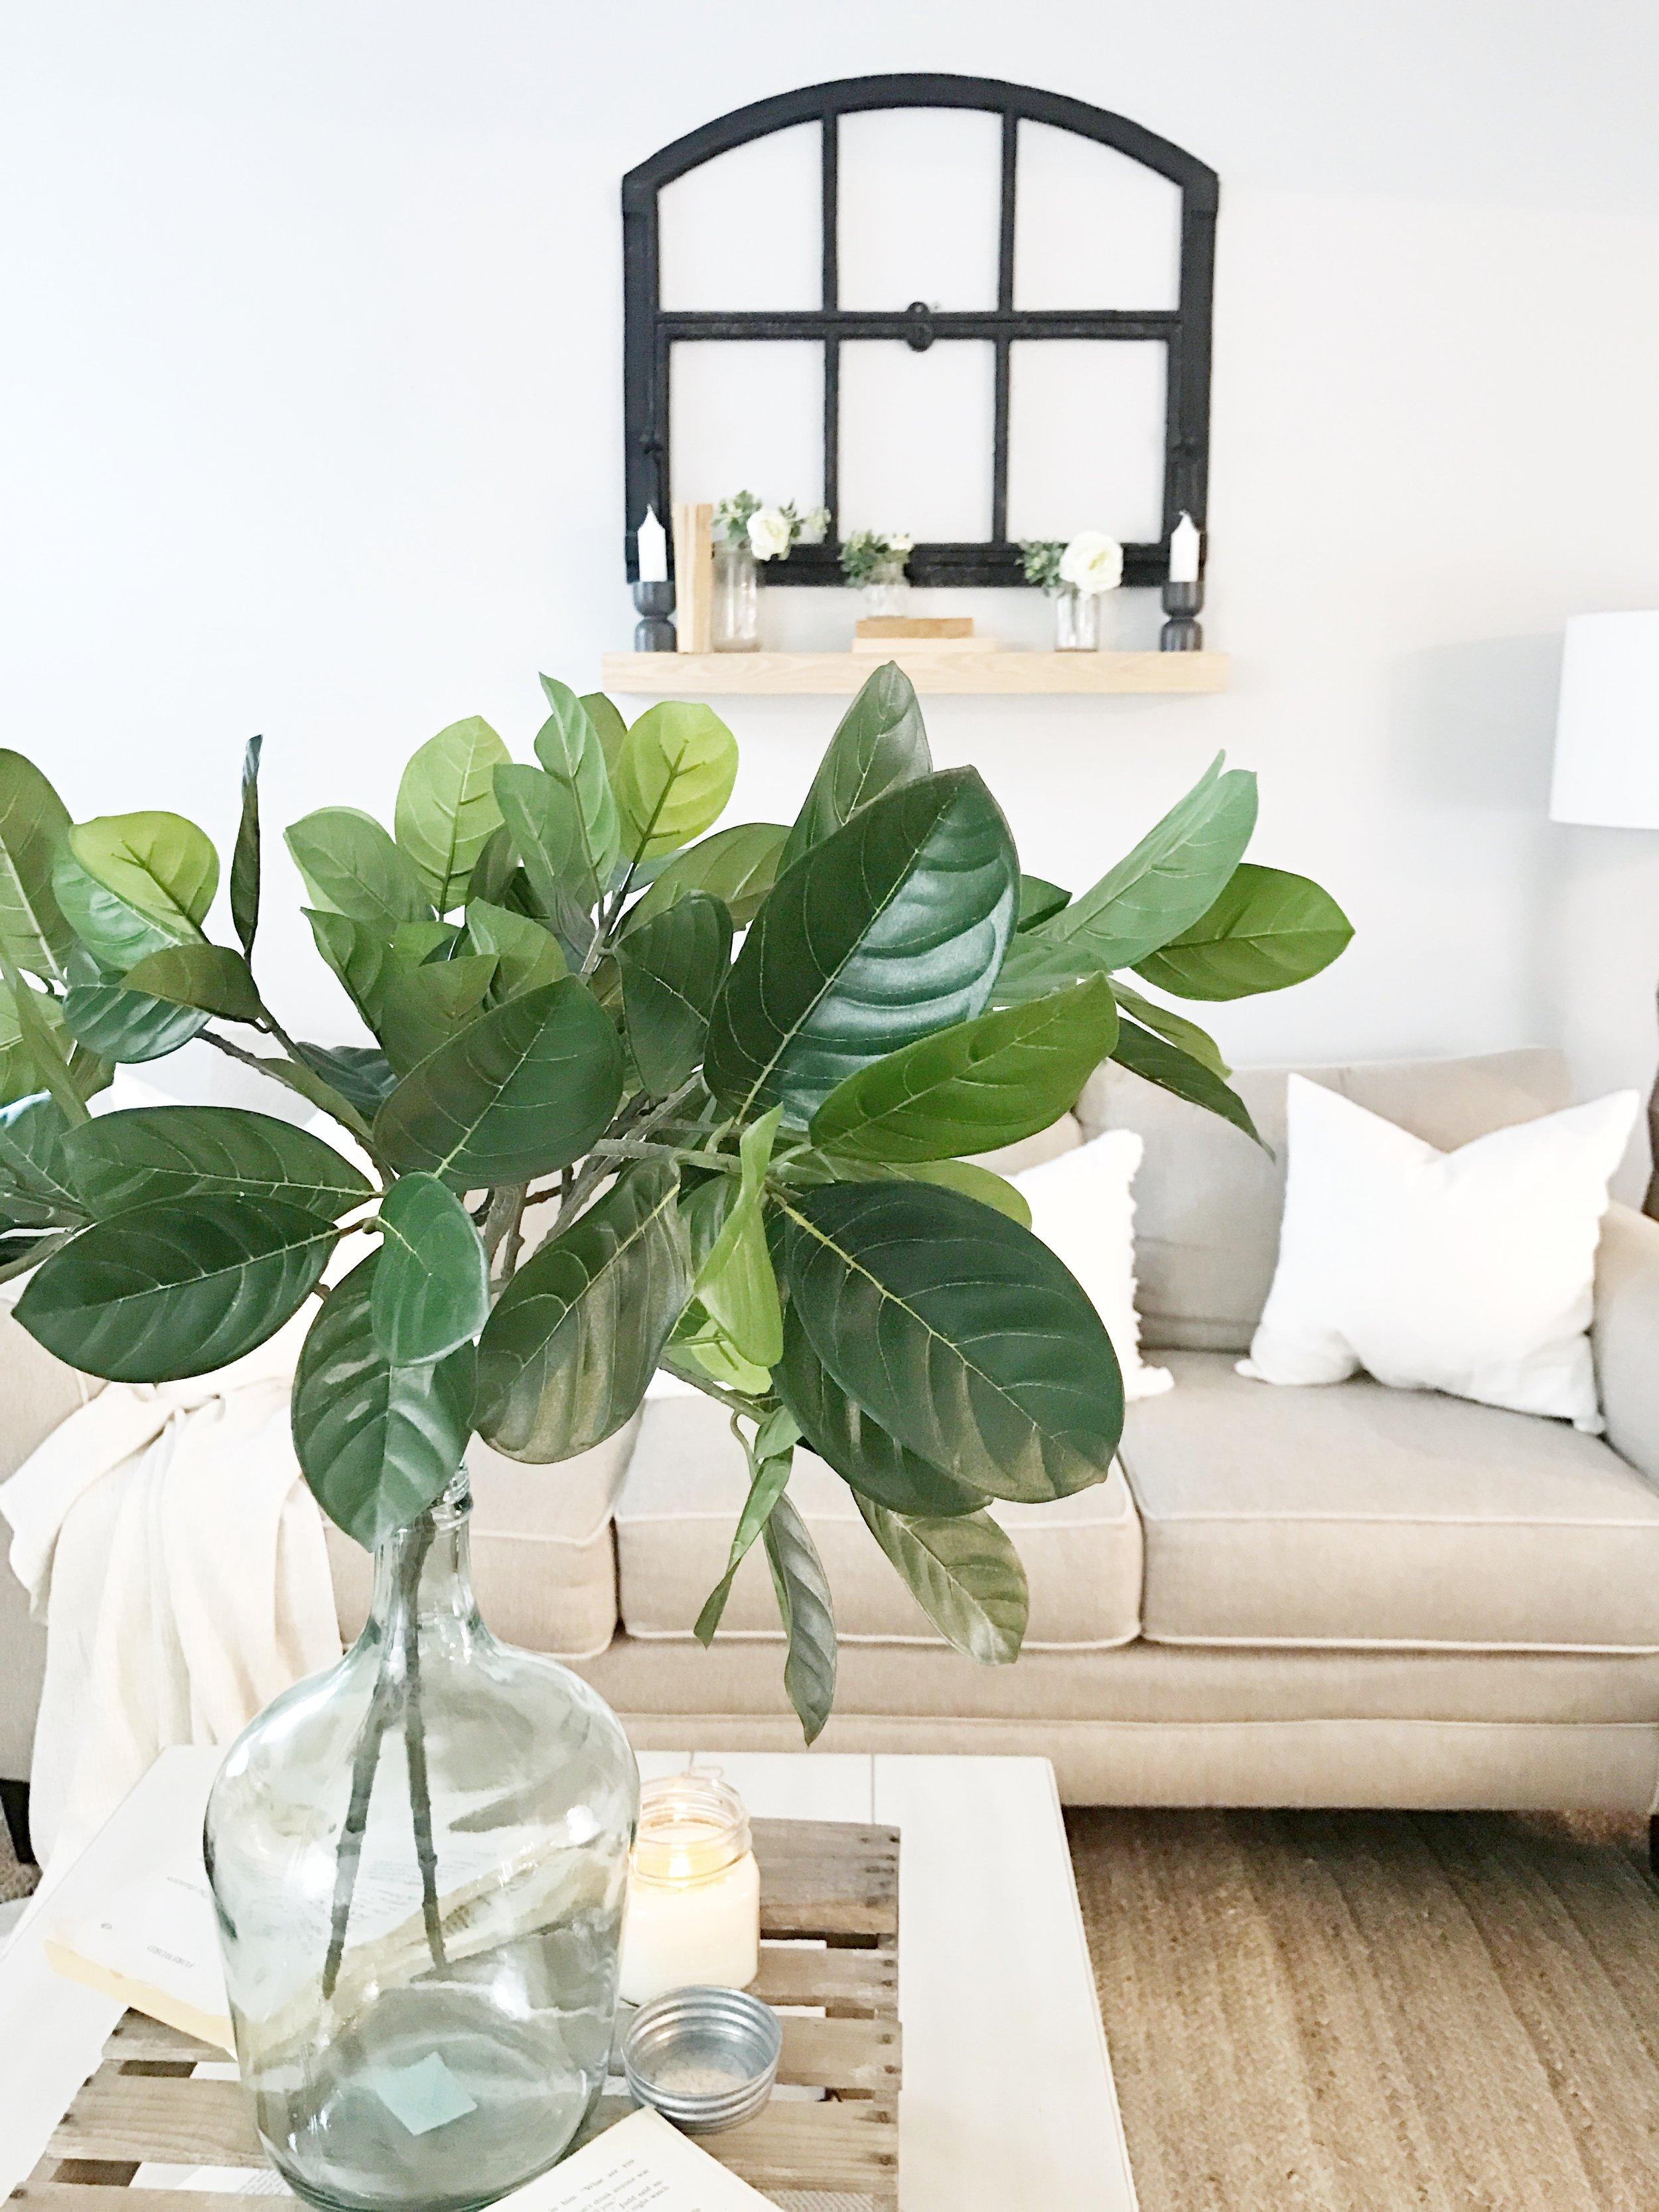 Farmhouse Style Living Room Coffee Table Center Piece- Fixer Upper Style- Interior Design by Plum Pretty Decor and Design